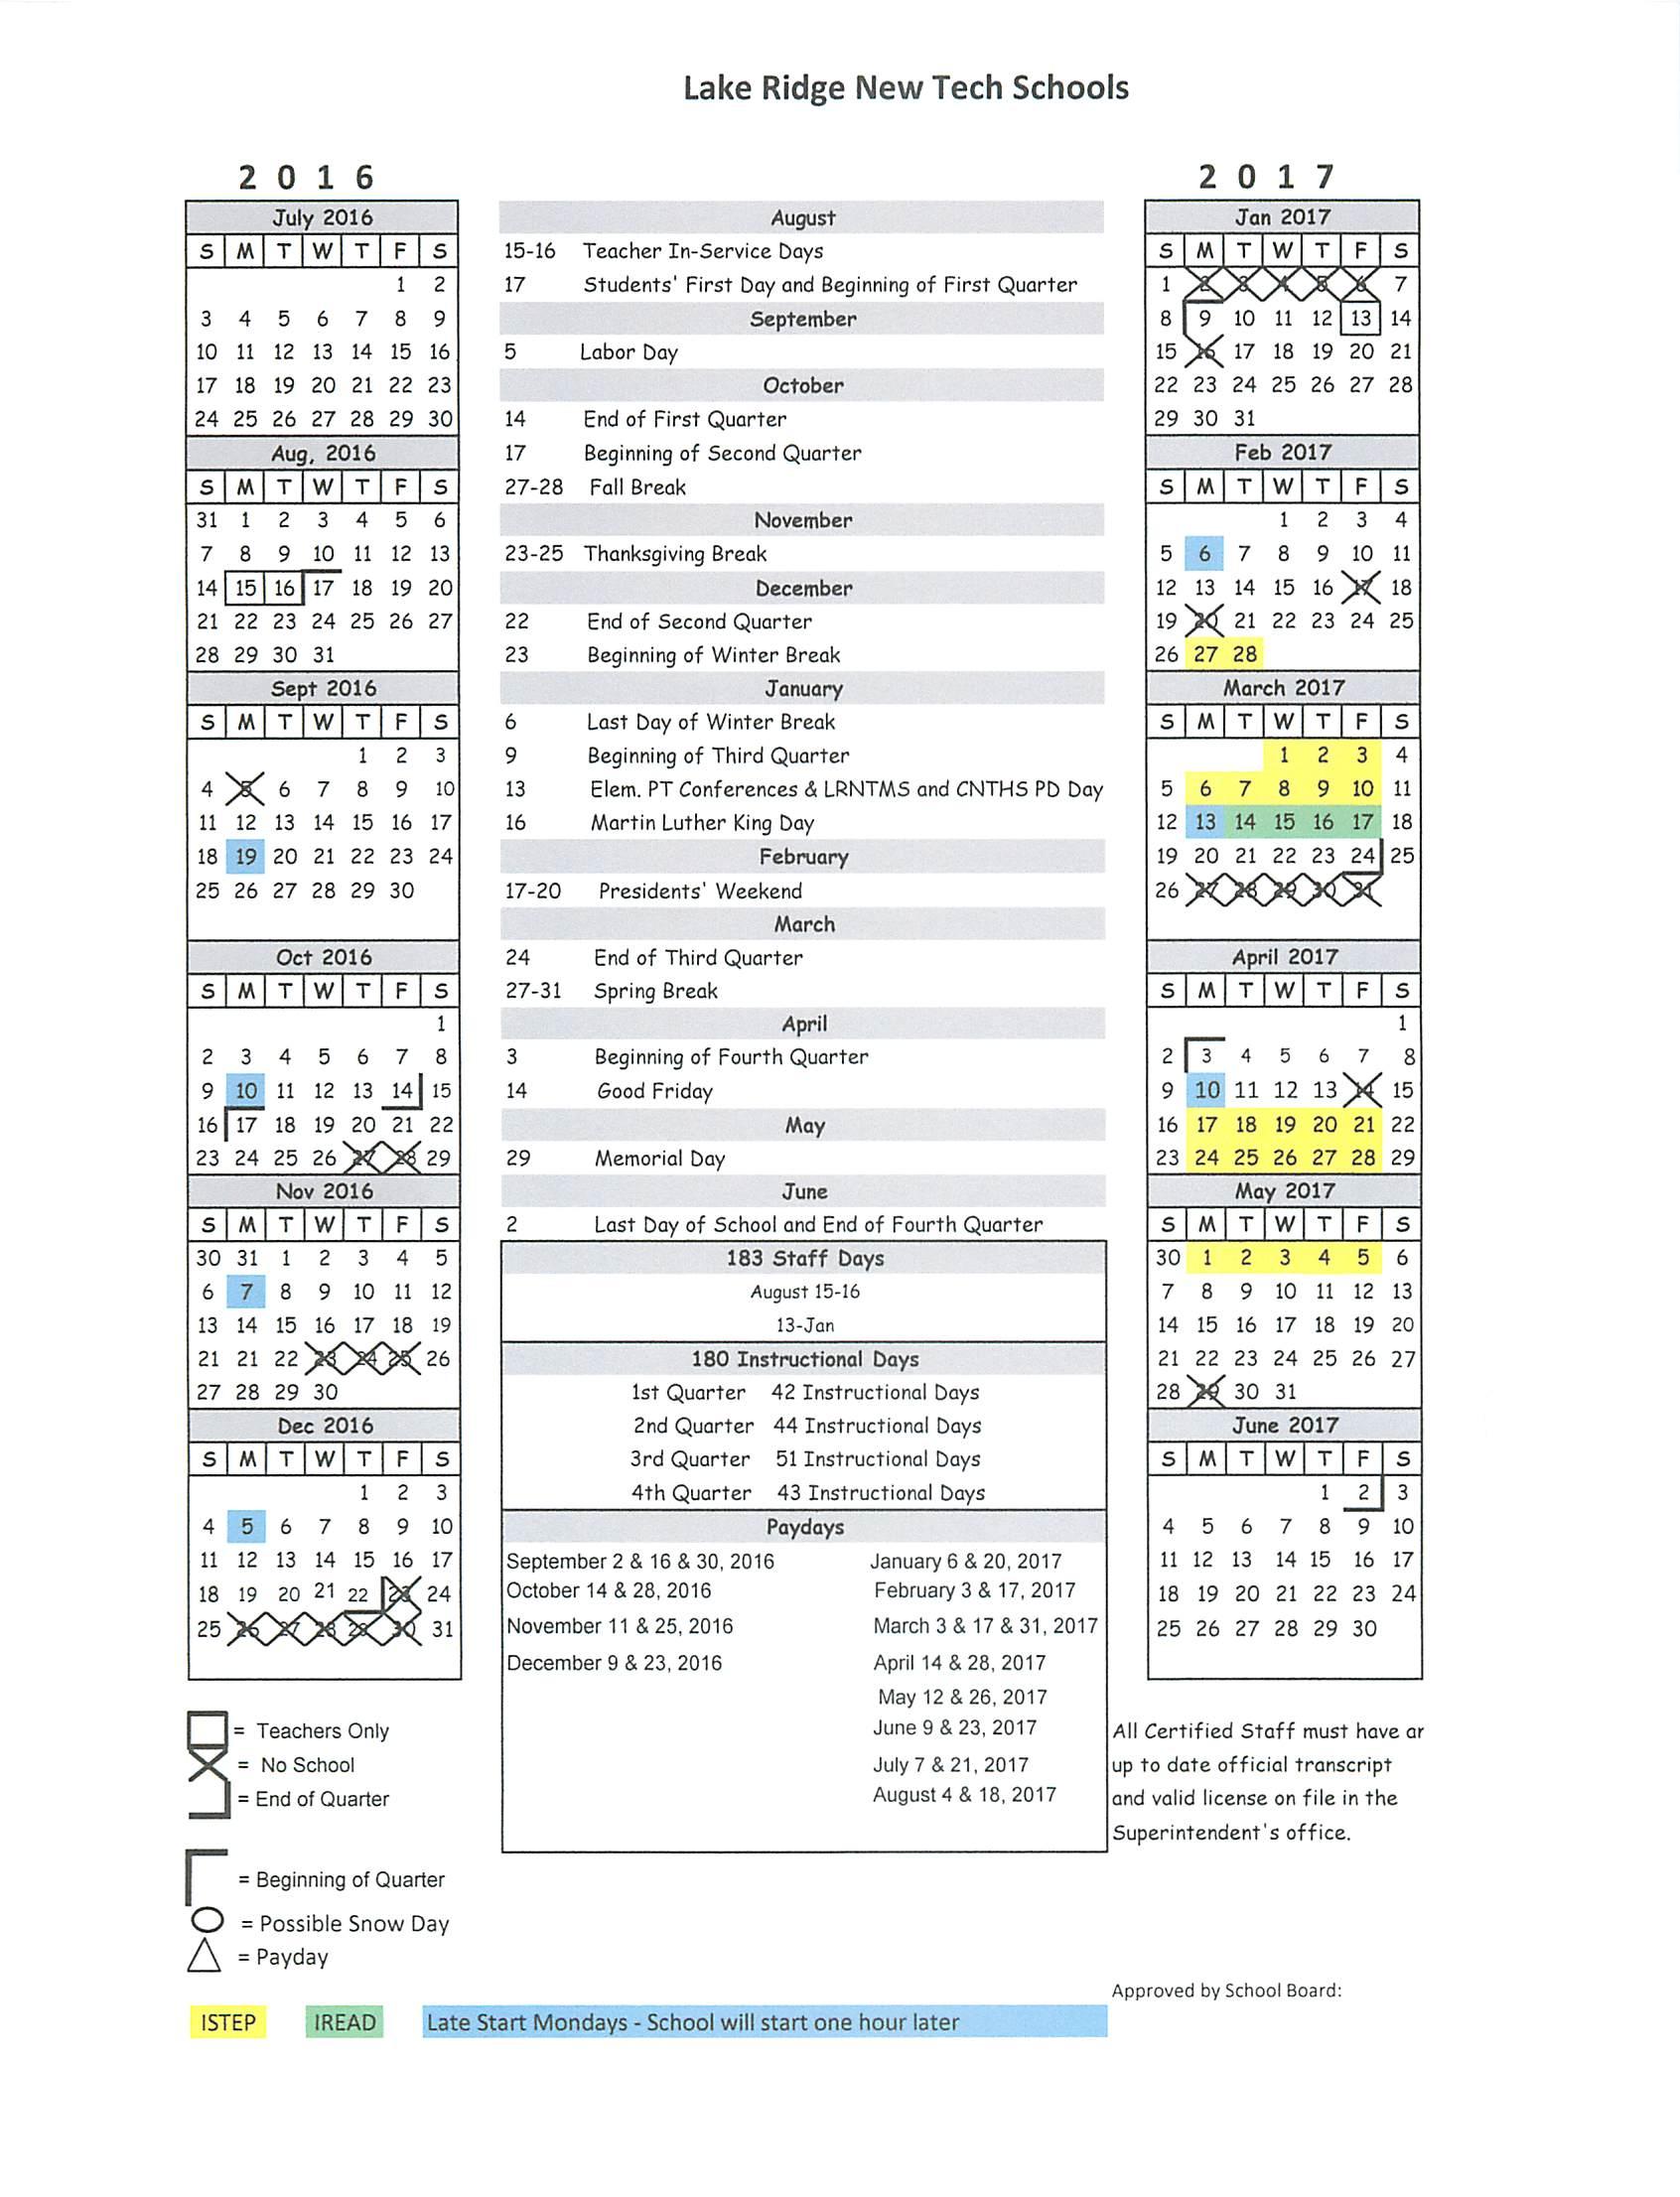 2016 2017 school calendar pcmac 2016 2017 school calendar